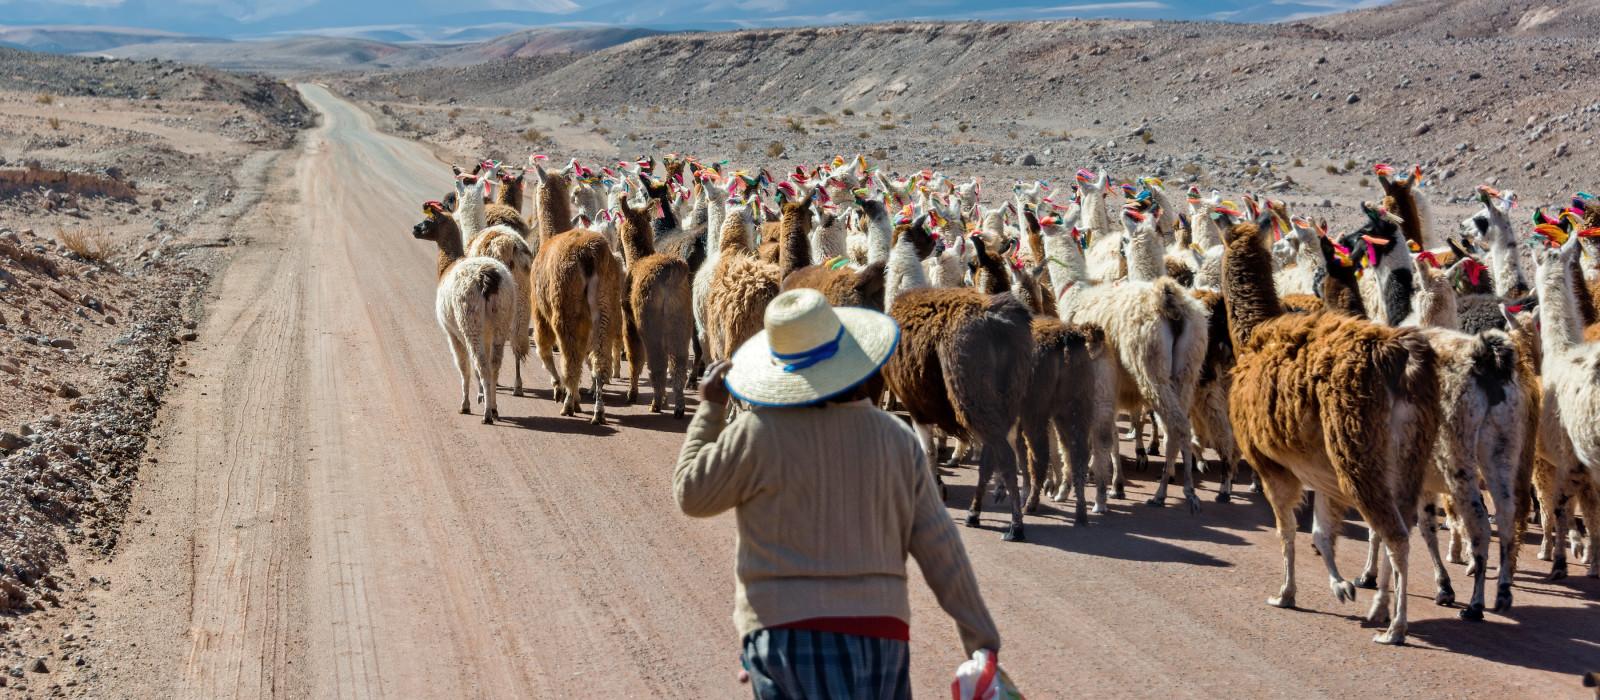 Woman herding llamas on a road near San Pedro de Atacama, Chile, South America